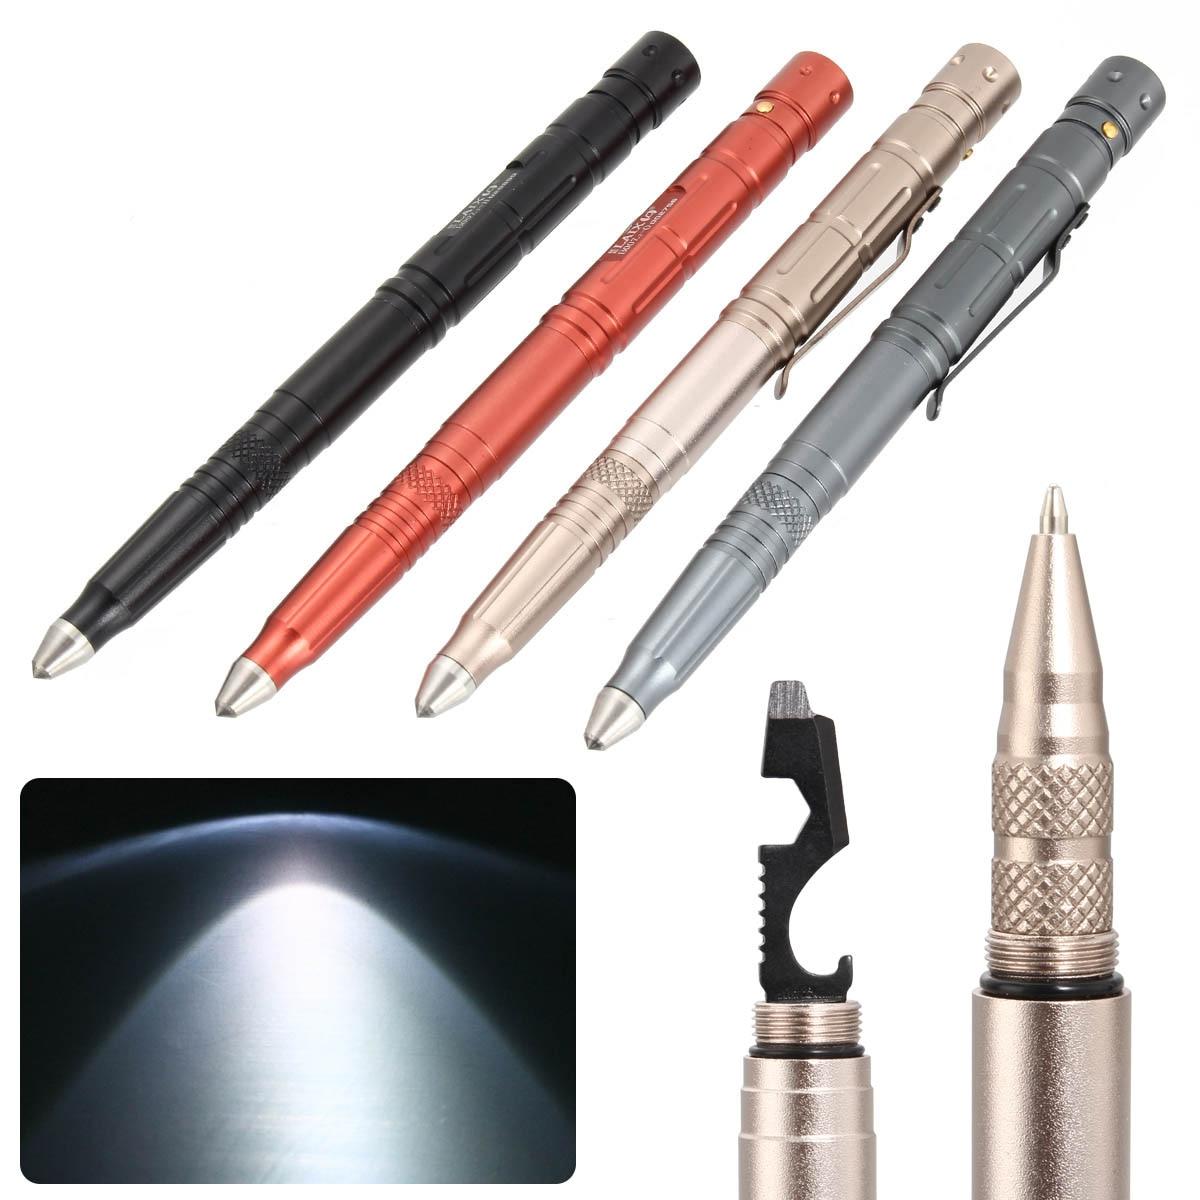 Multi-function Tactical Pen Survival Military LED Flashlight Glass Breaker Self Defense Tool Ballpoint Pens HJ55